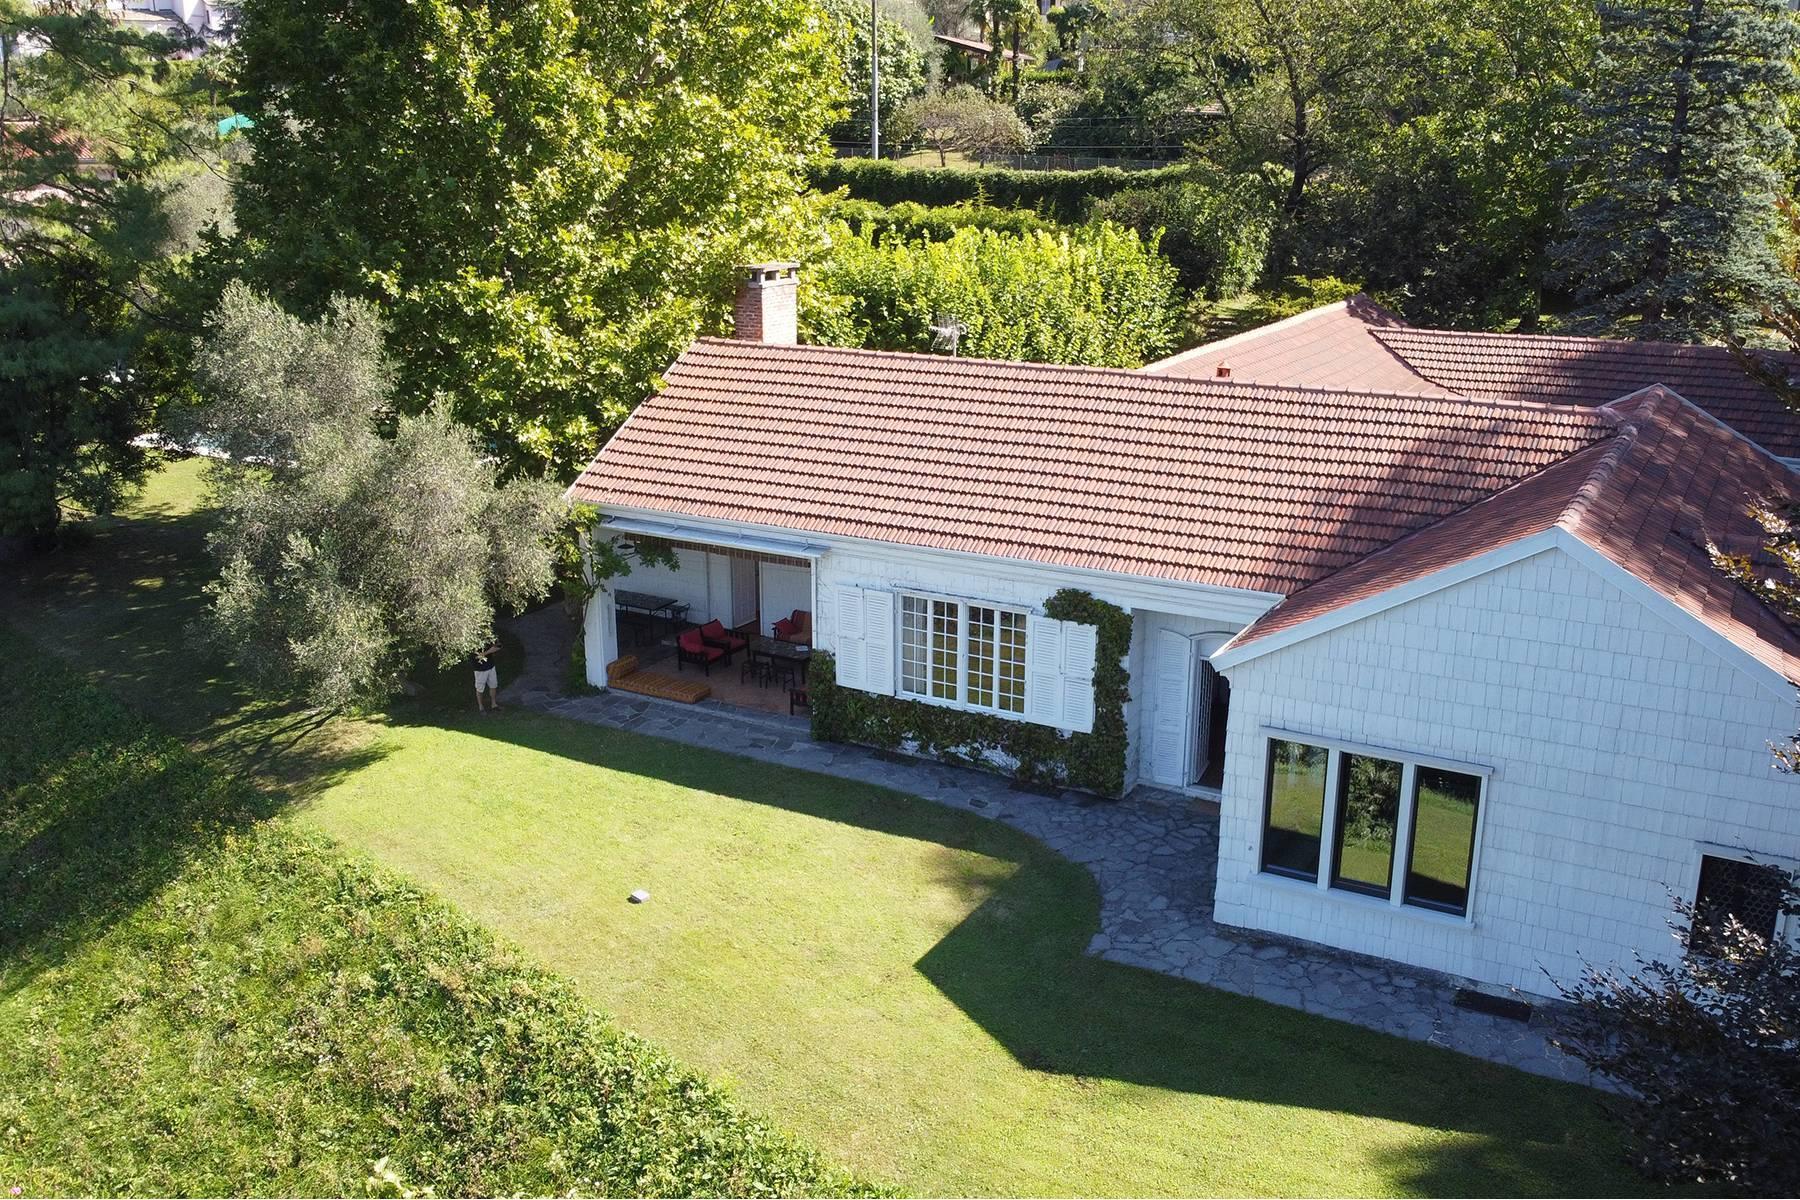 Splendida villa d'epoca con vista lago mozzafiato - 3